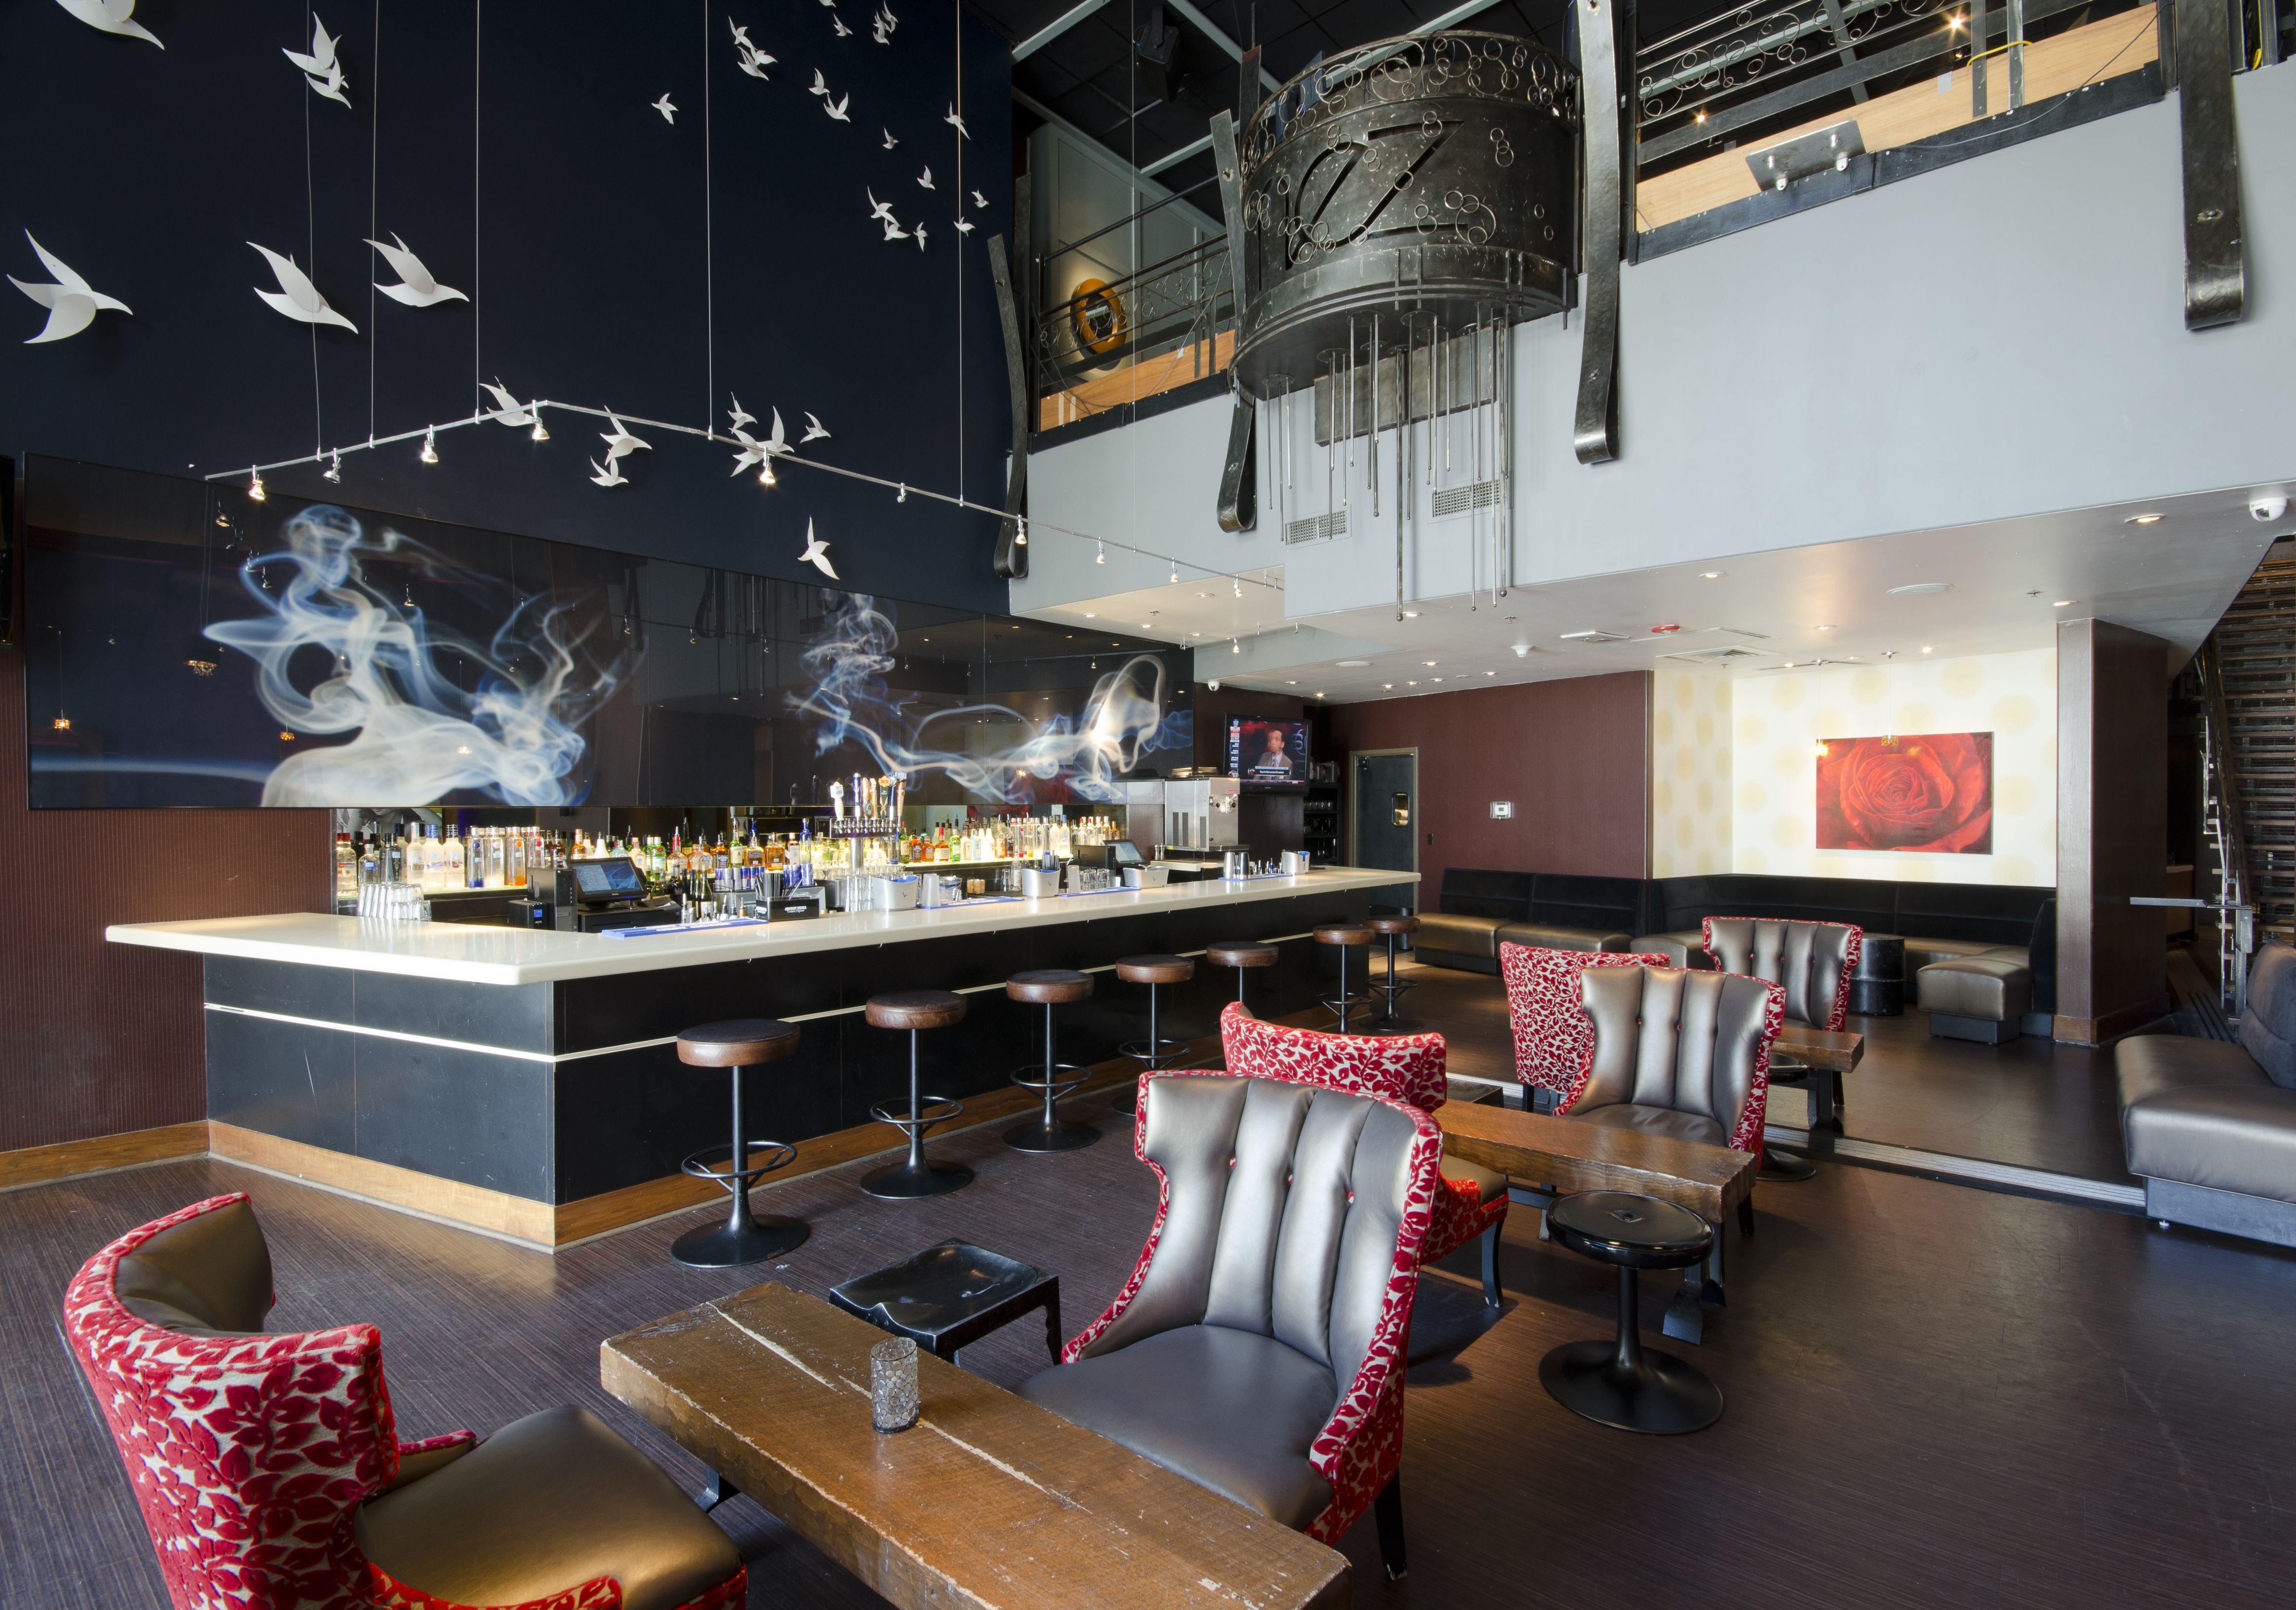 Smg epicentre bar home decor bar lounge home